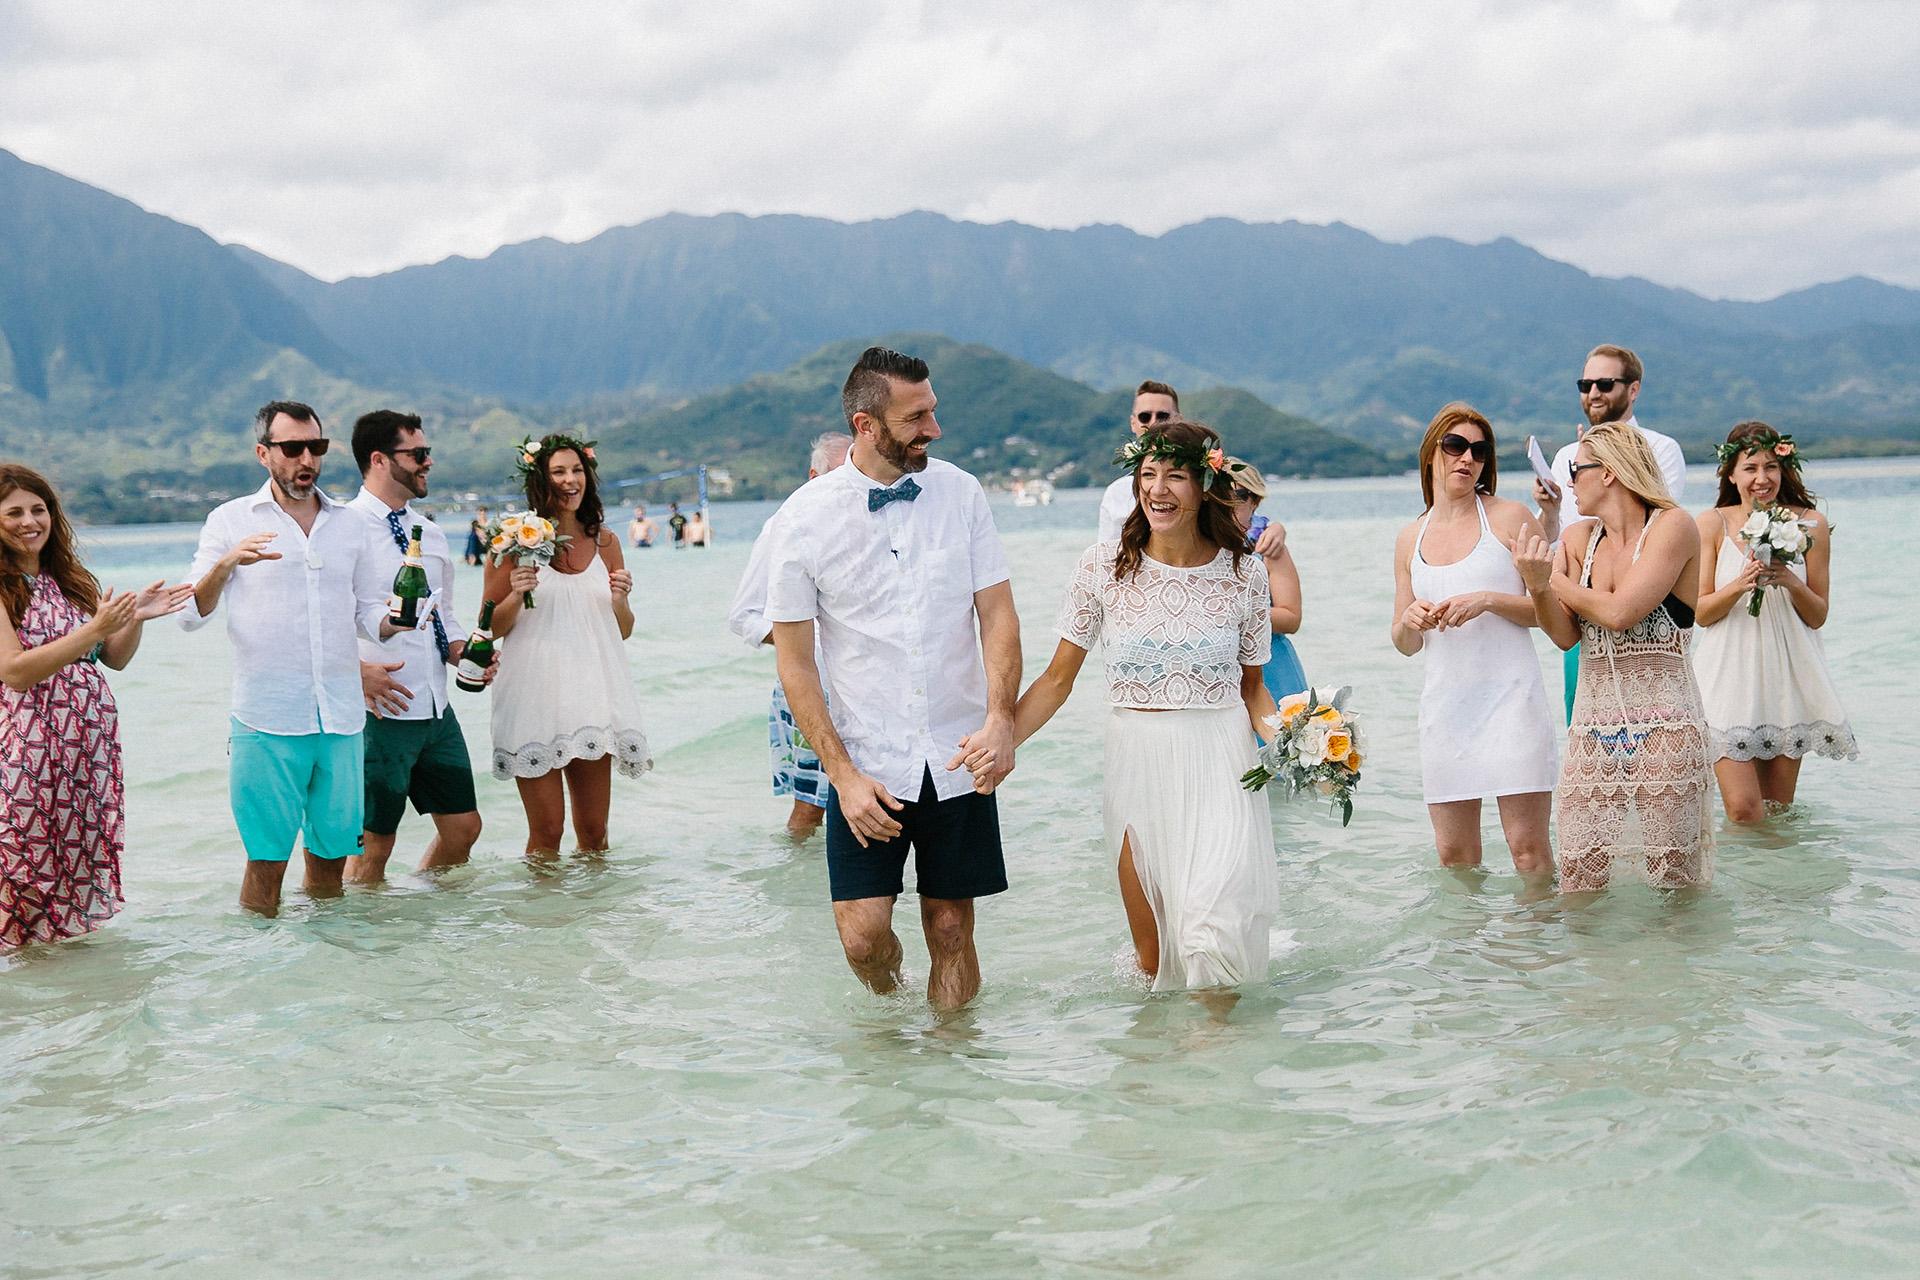 Joe katies sandbar wedding in hawaii geoff duncan austin joe simon and katie stevens wedding junglespirit Choice Image